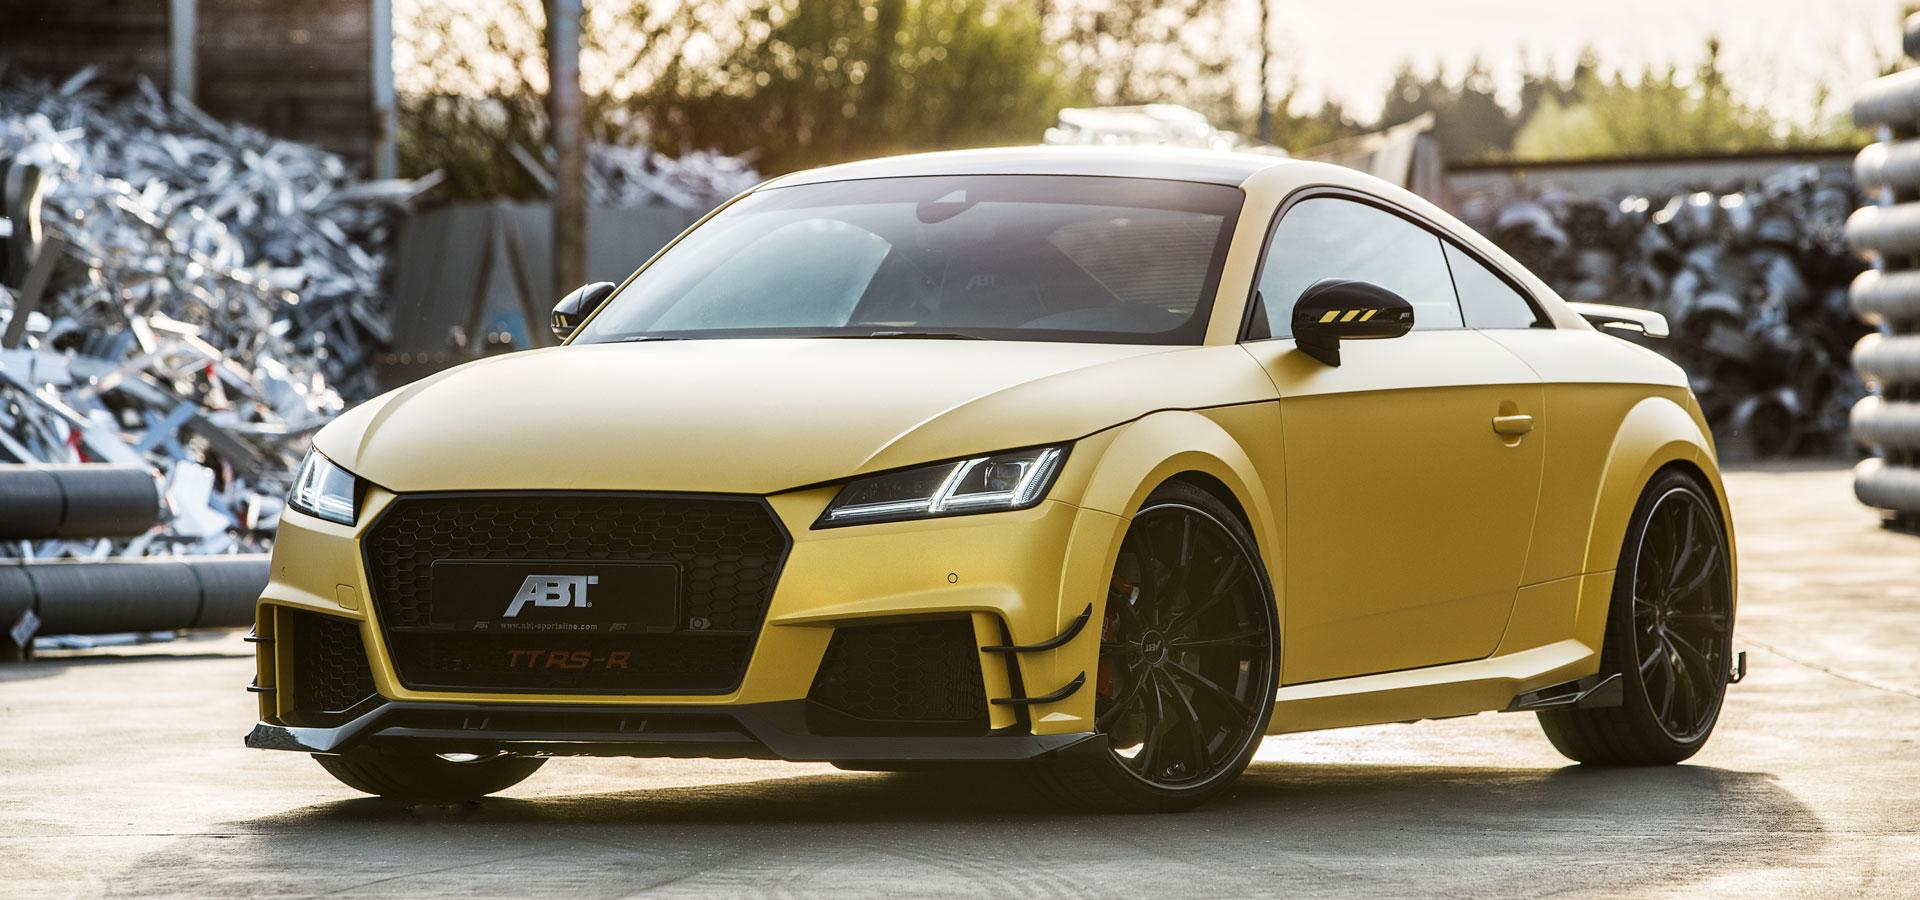 Audi Tt Rs >> Abt Tt Rs R Abt Sportsline